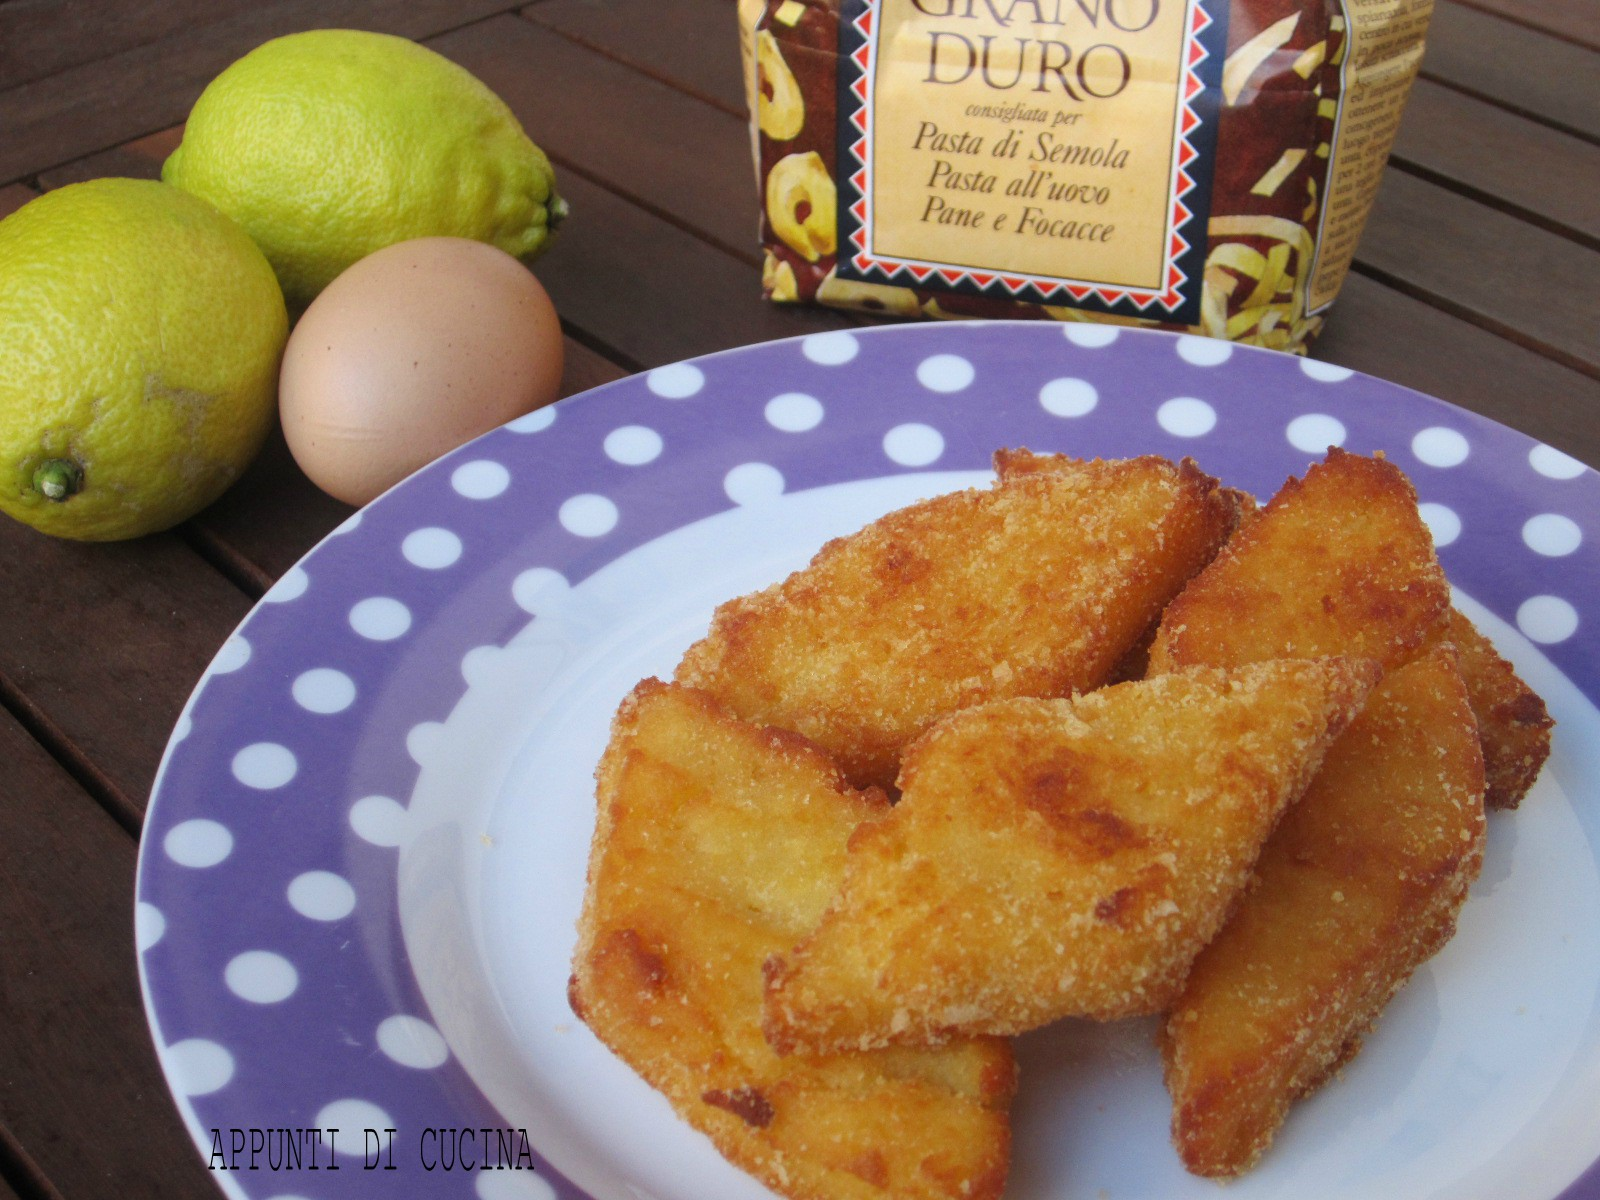 frittura dolce piemontese